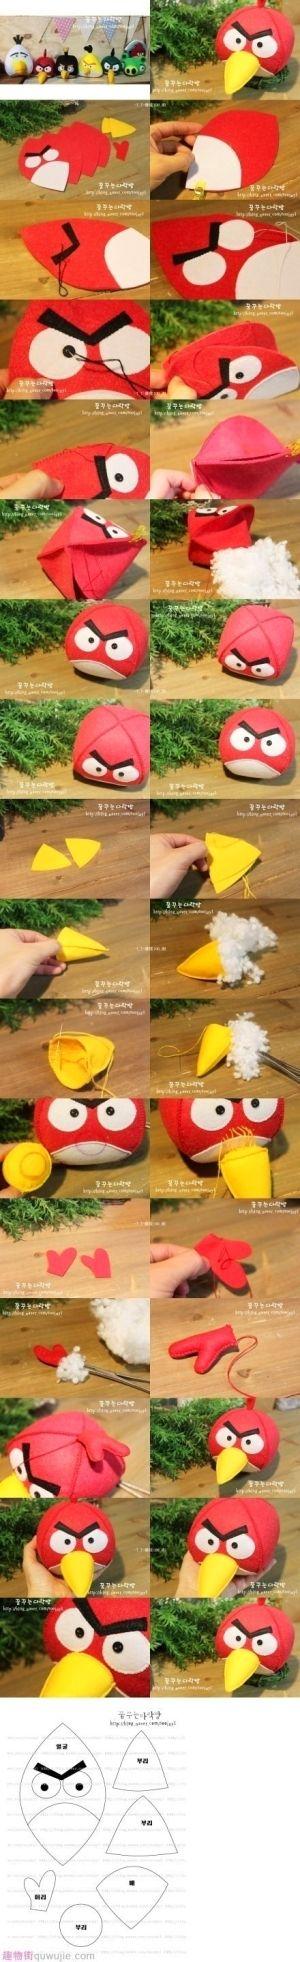 DIY Angry Bird Doll DIY Angry Bird Doll by diyforever